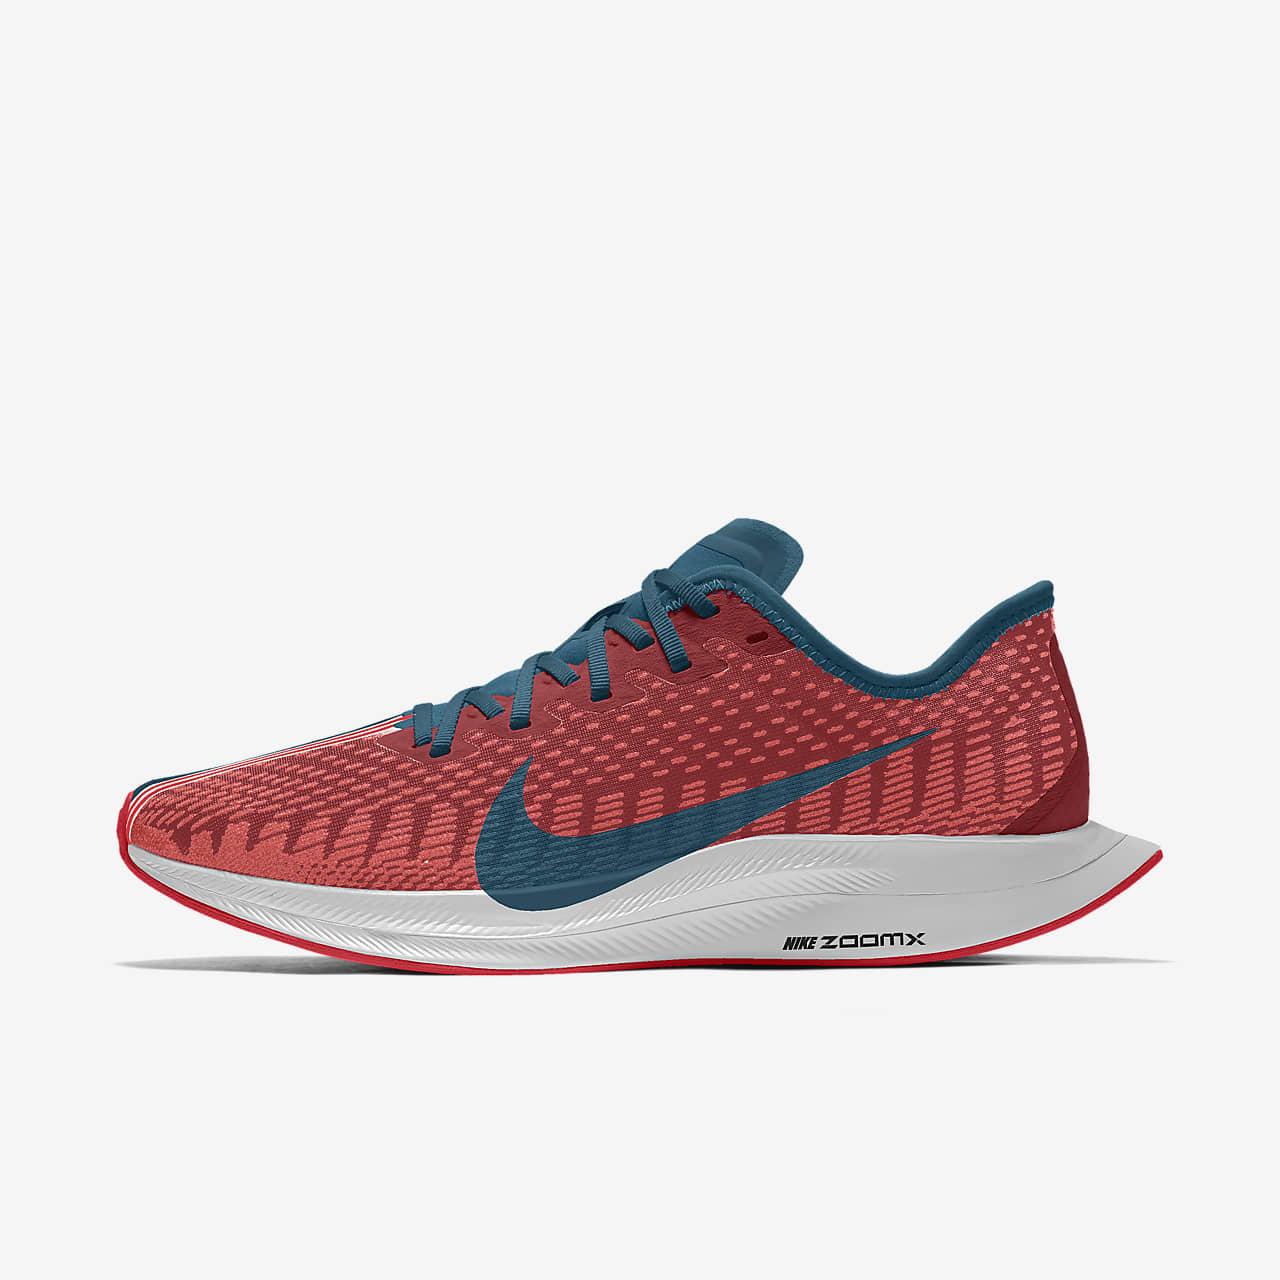 Nike Zoom Pegasus Turbo 2 Premium By You Custom Women's Running Shoe